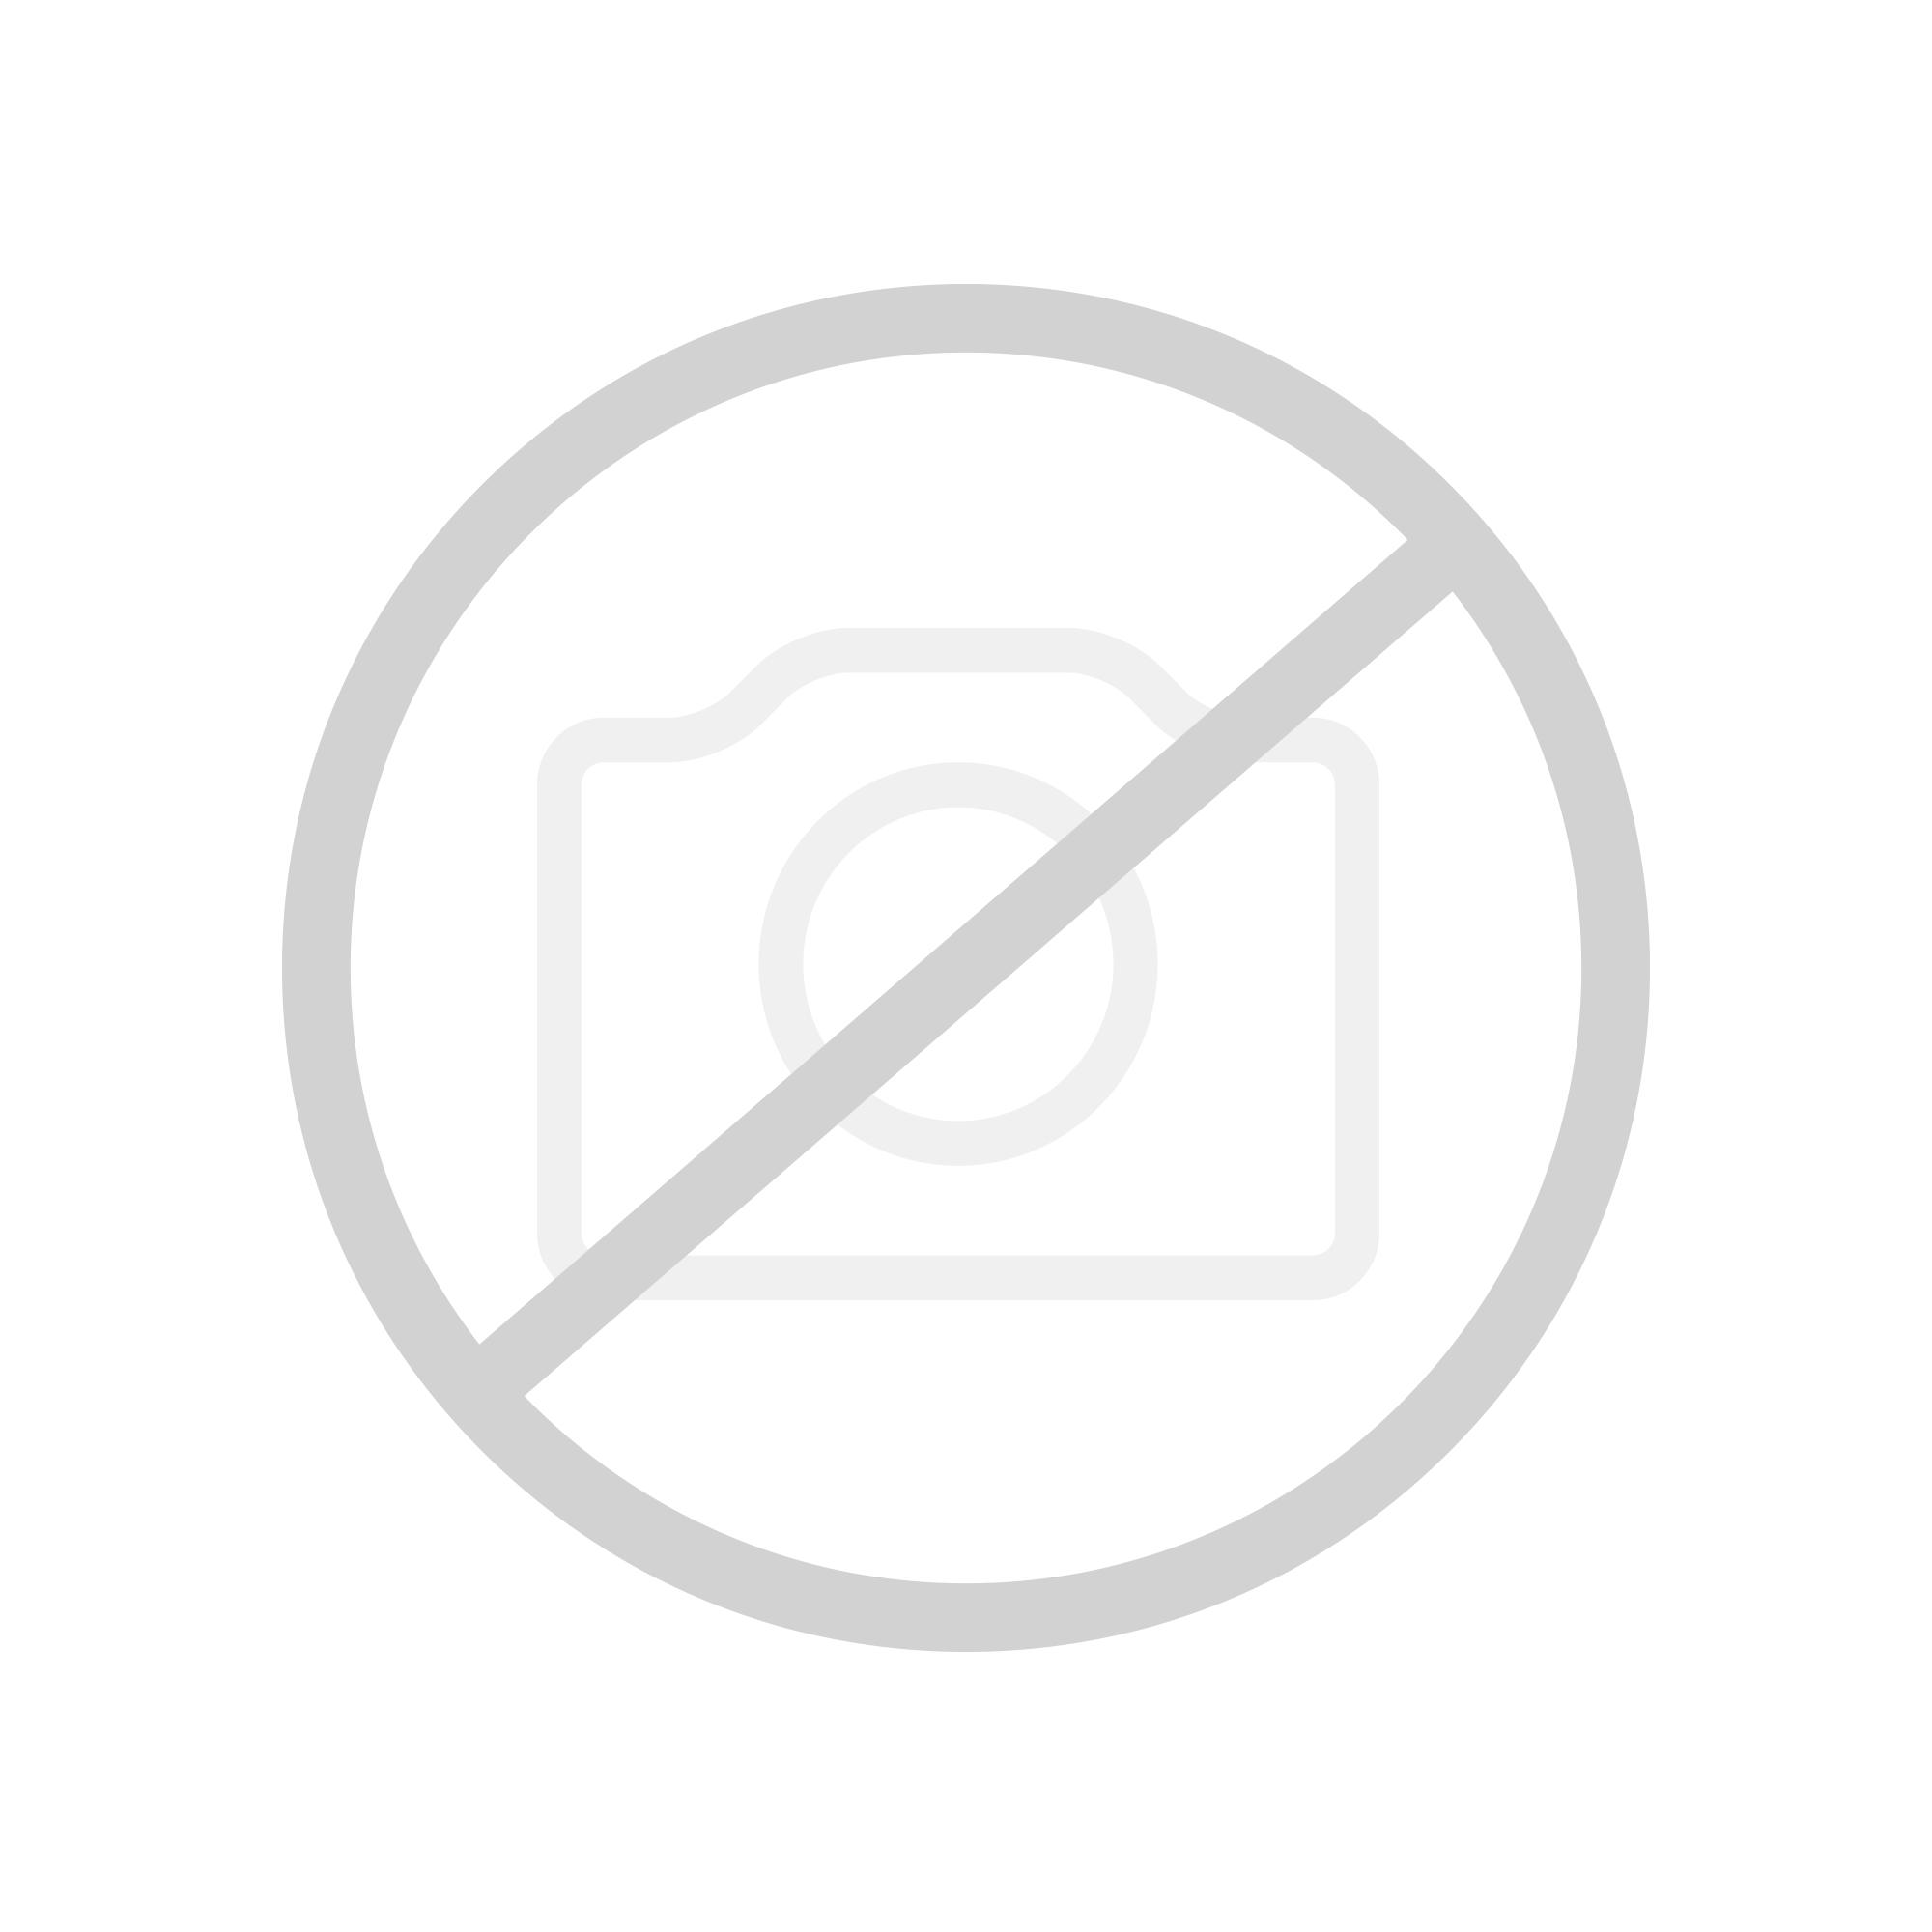 hsk asp 300 spiegelschrank tiefenreduziert 1102075 tr. Black Bedroom Furniture Sets. Home Design Ideas